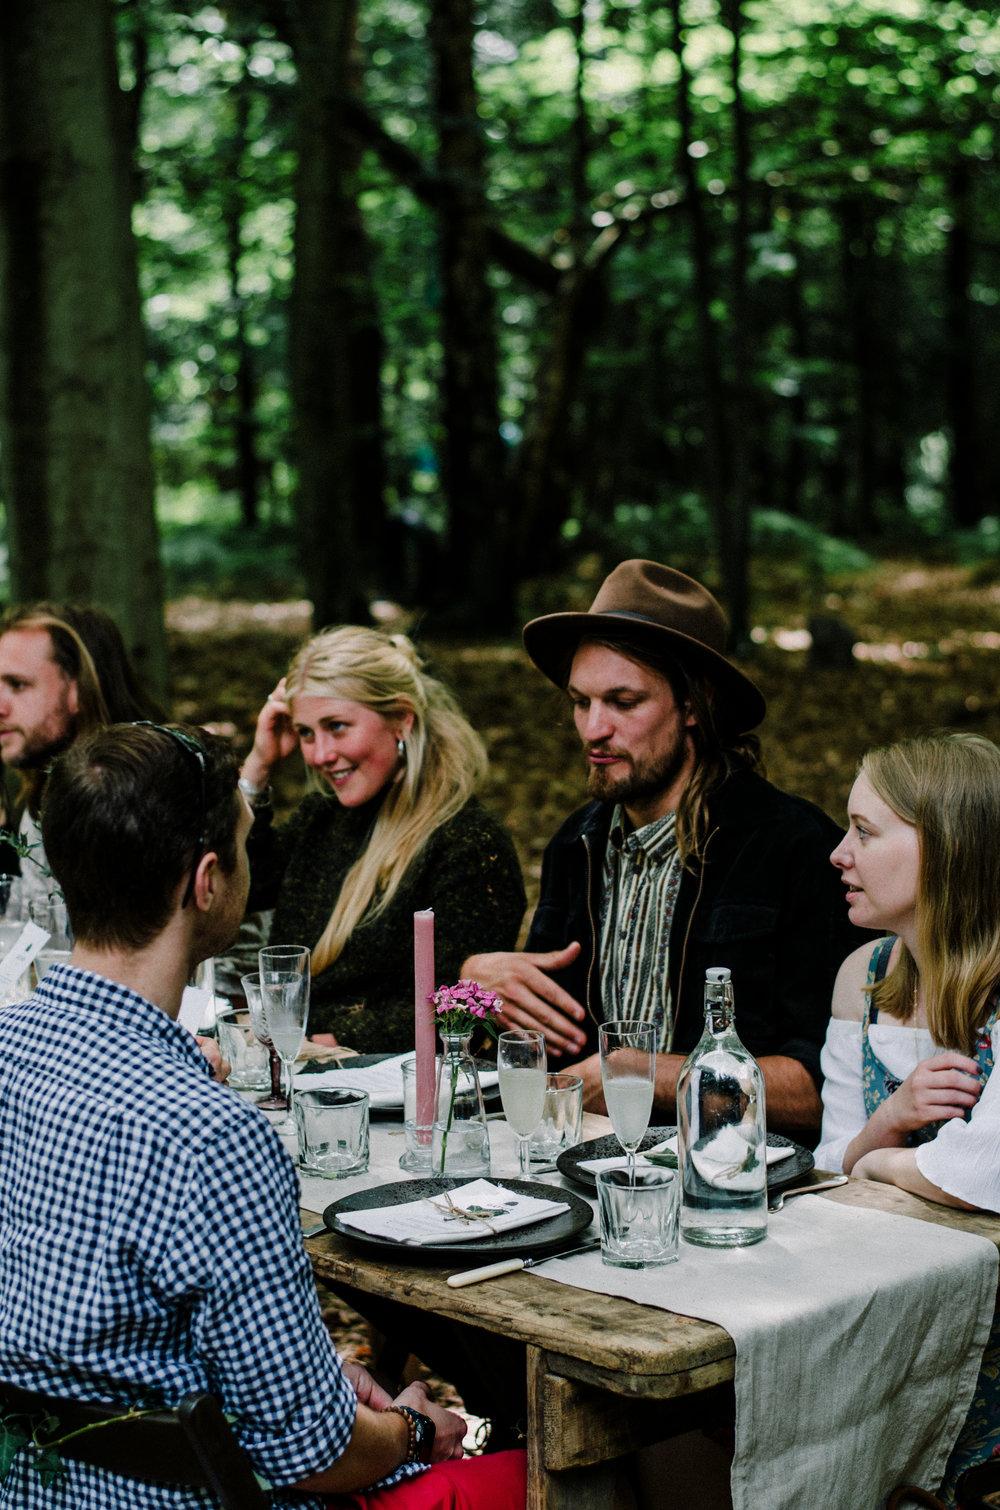 Gather with Fire & Wild - Aiste Saulyte Photography-20.jpg